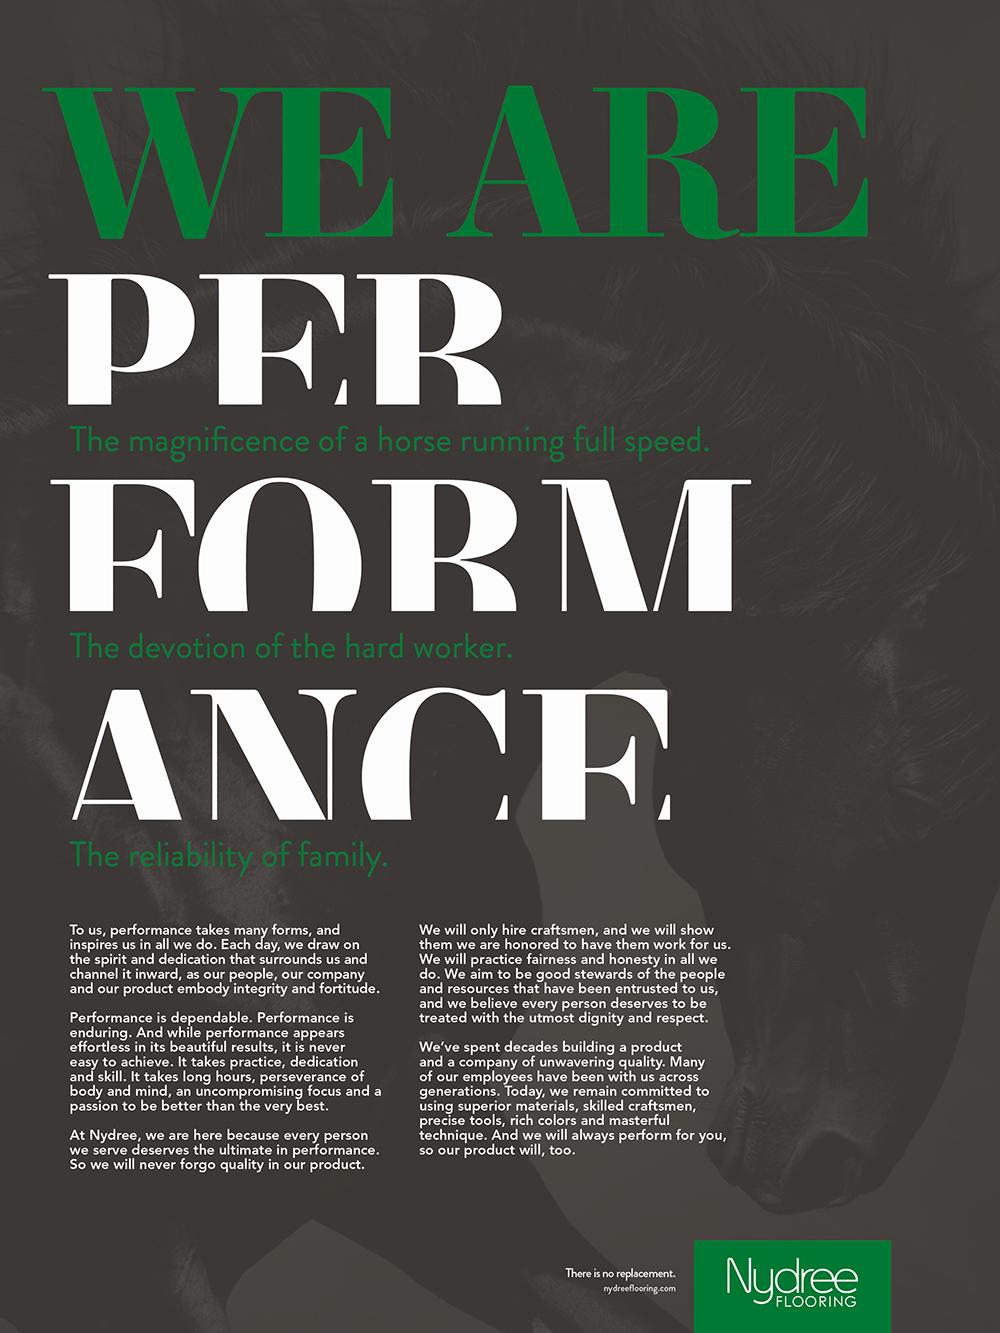 Nydree_Brand-Manifesto-Poster_WEB.jpg